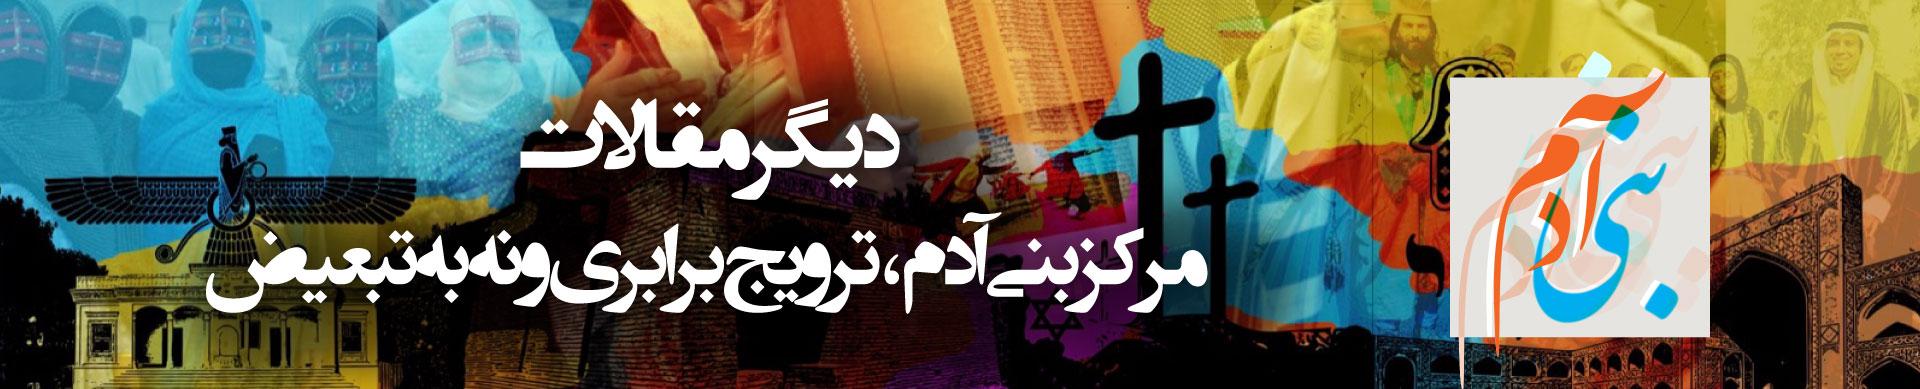 bani-adam-footer-banner